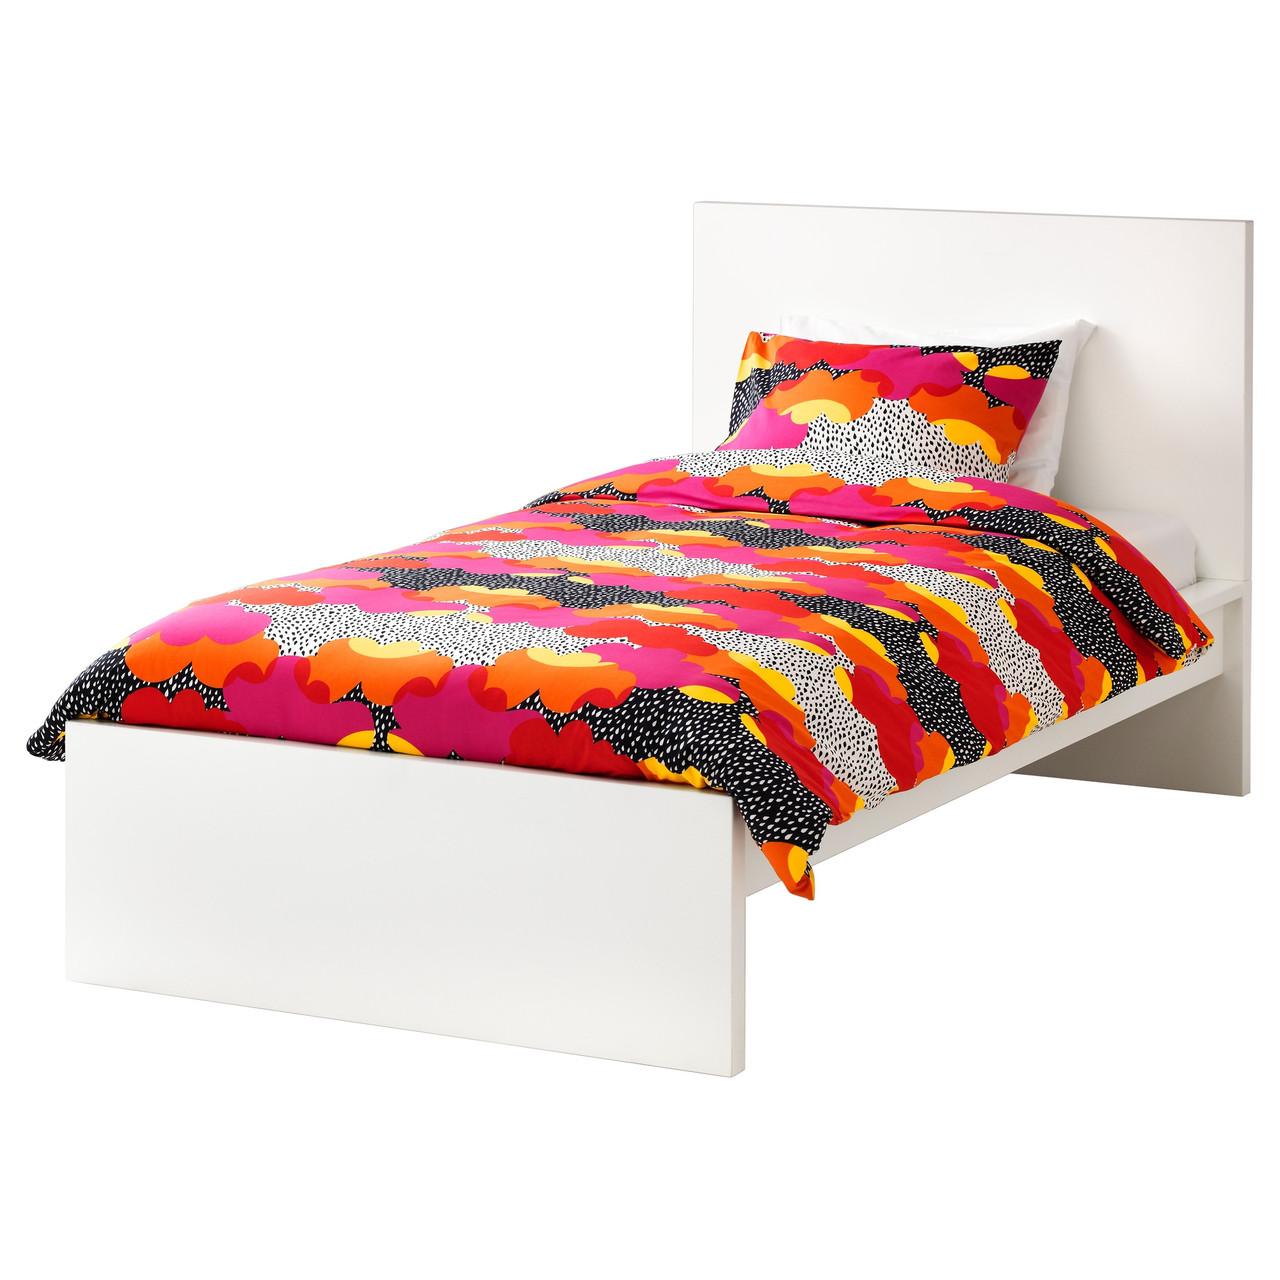 MALM Каркас кровати, высокий, белый, Luröy 190.095.62